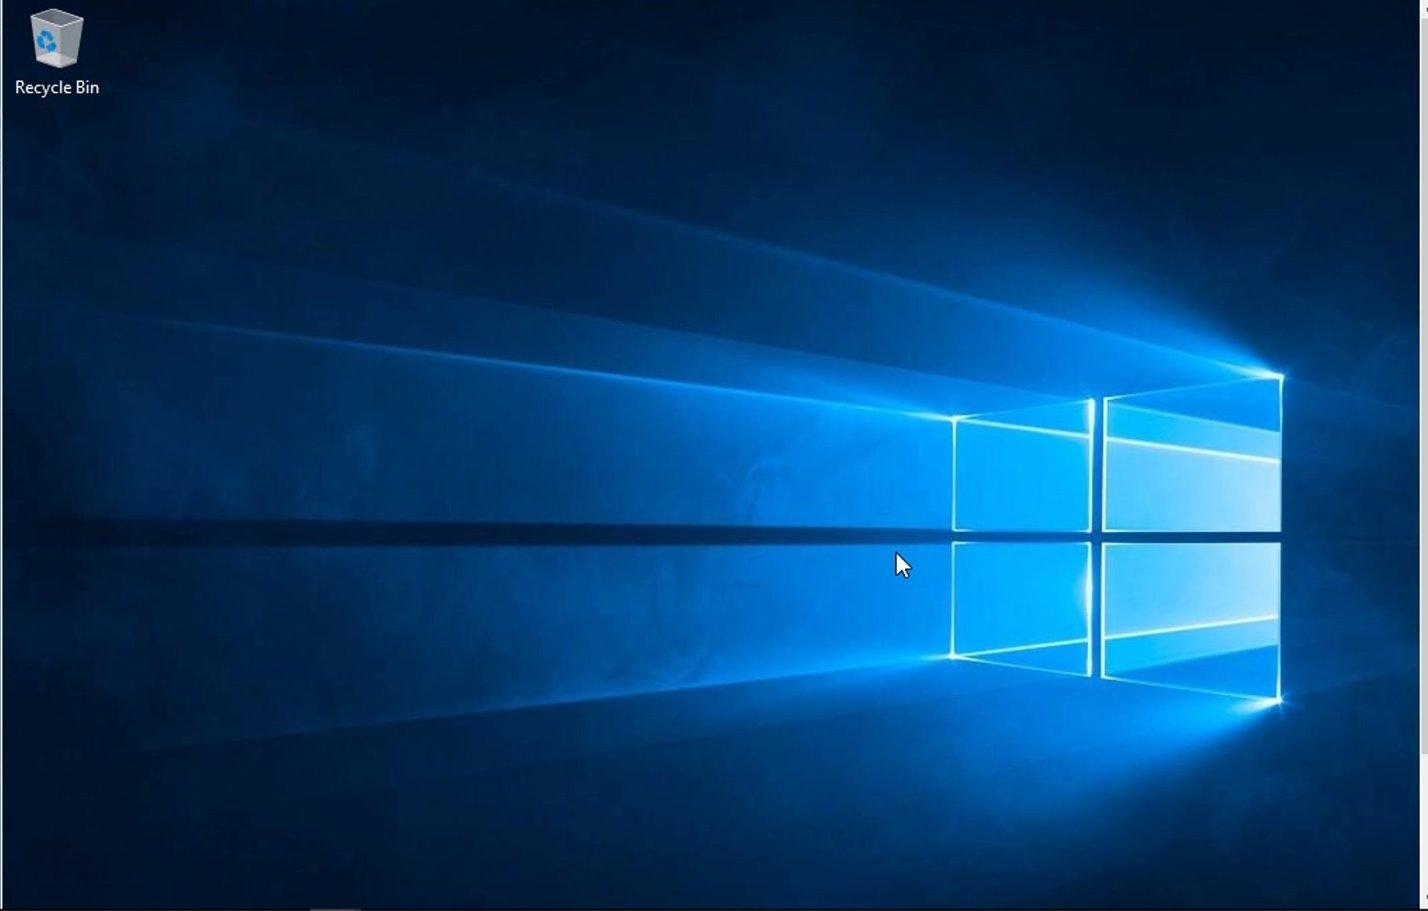 ITFORVN Bài 1 Part1 Cài đặt Windows Server 2016 34 e1491172007176 - [Tự học MCSA MCSE 2016] - Lab-1-Part1-Cài đặt Windows Server 2016